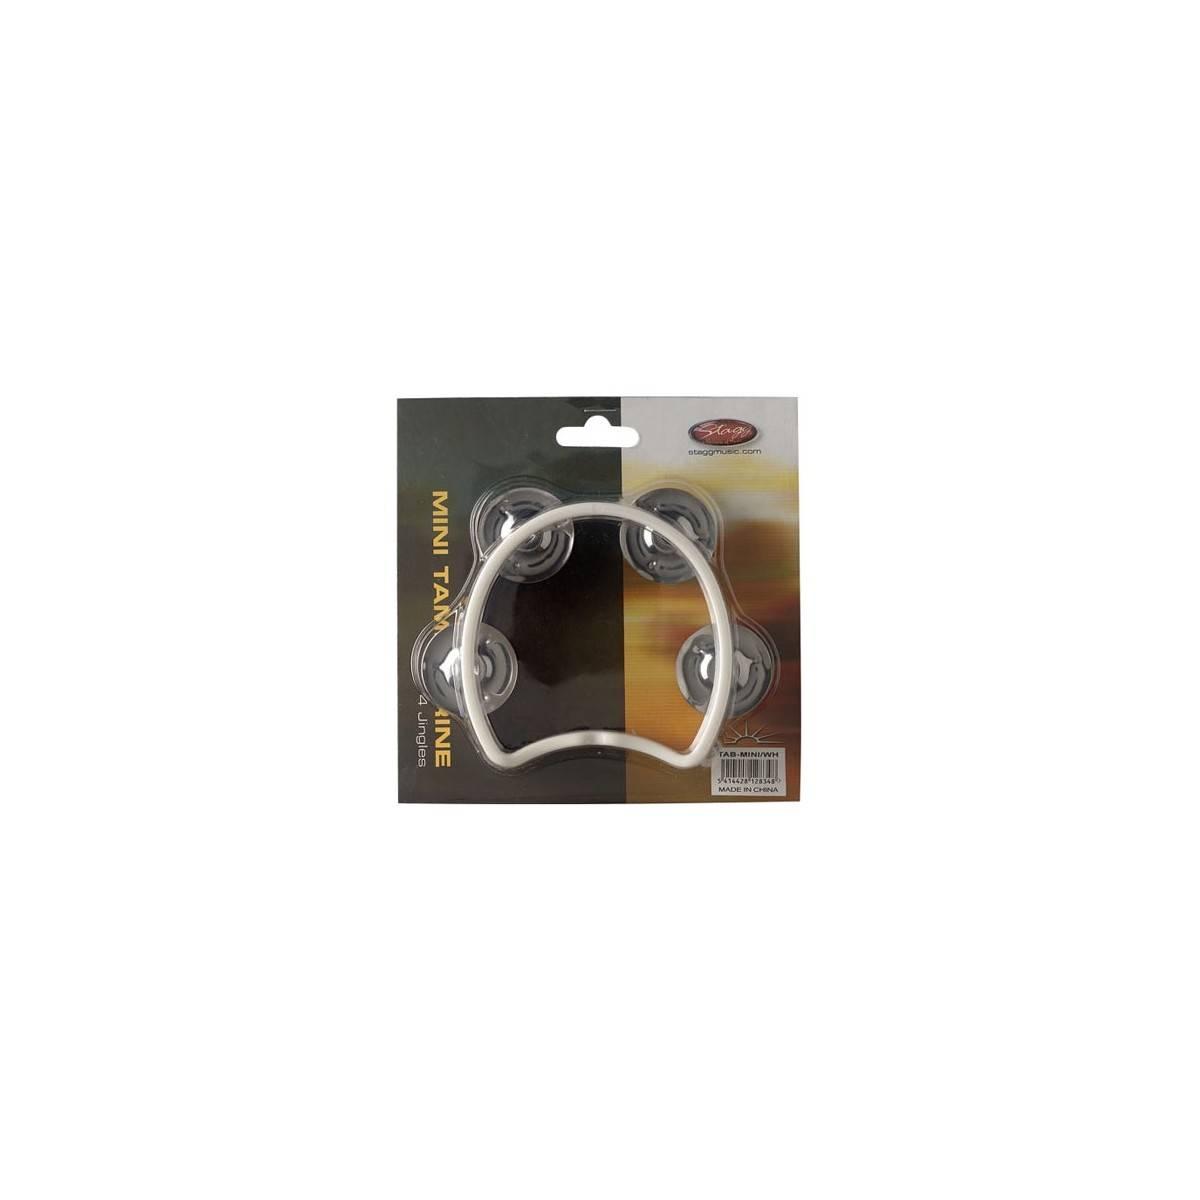 Mini tambourin cymbalettes blanc